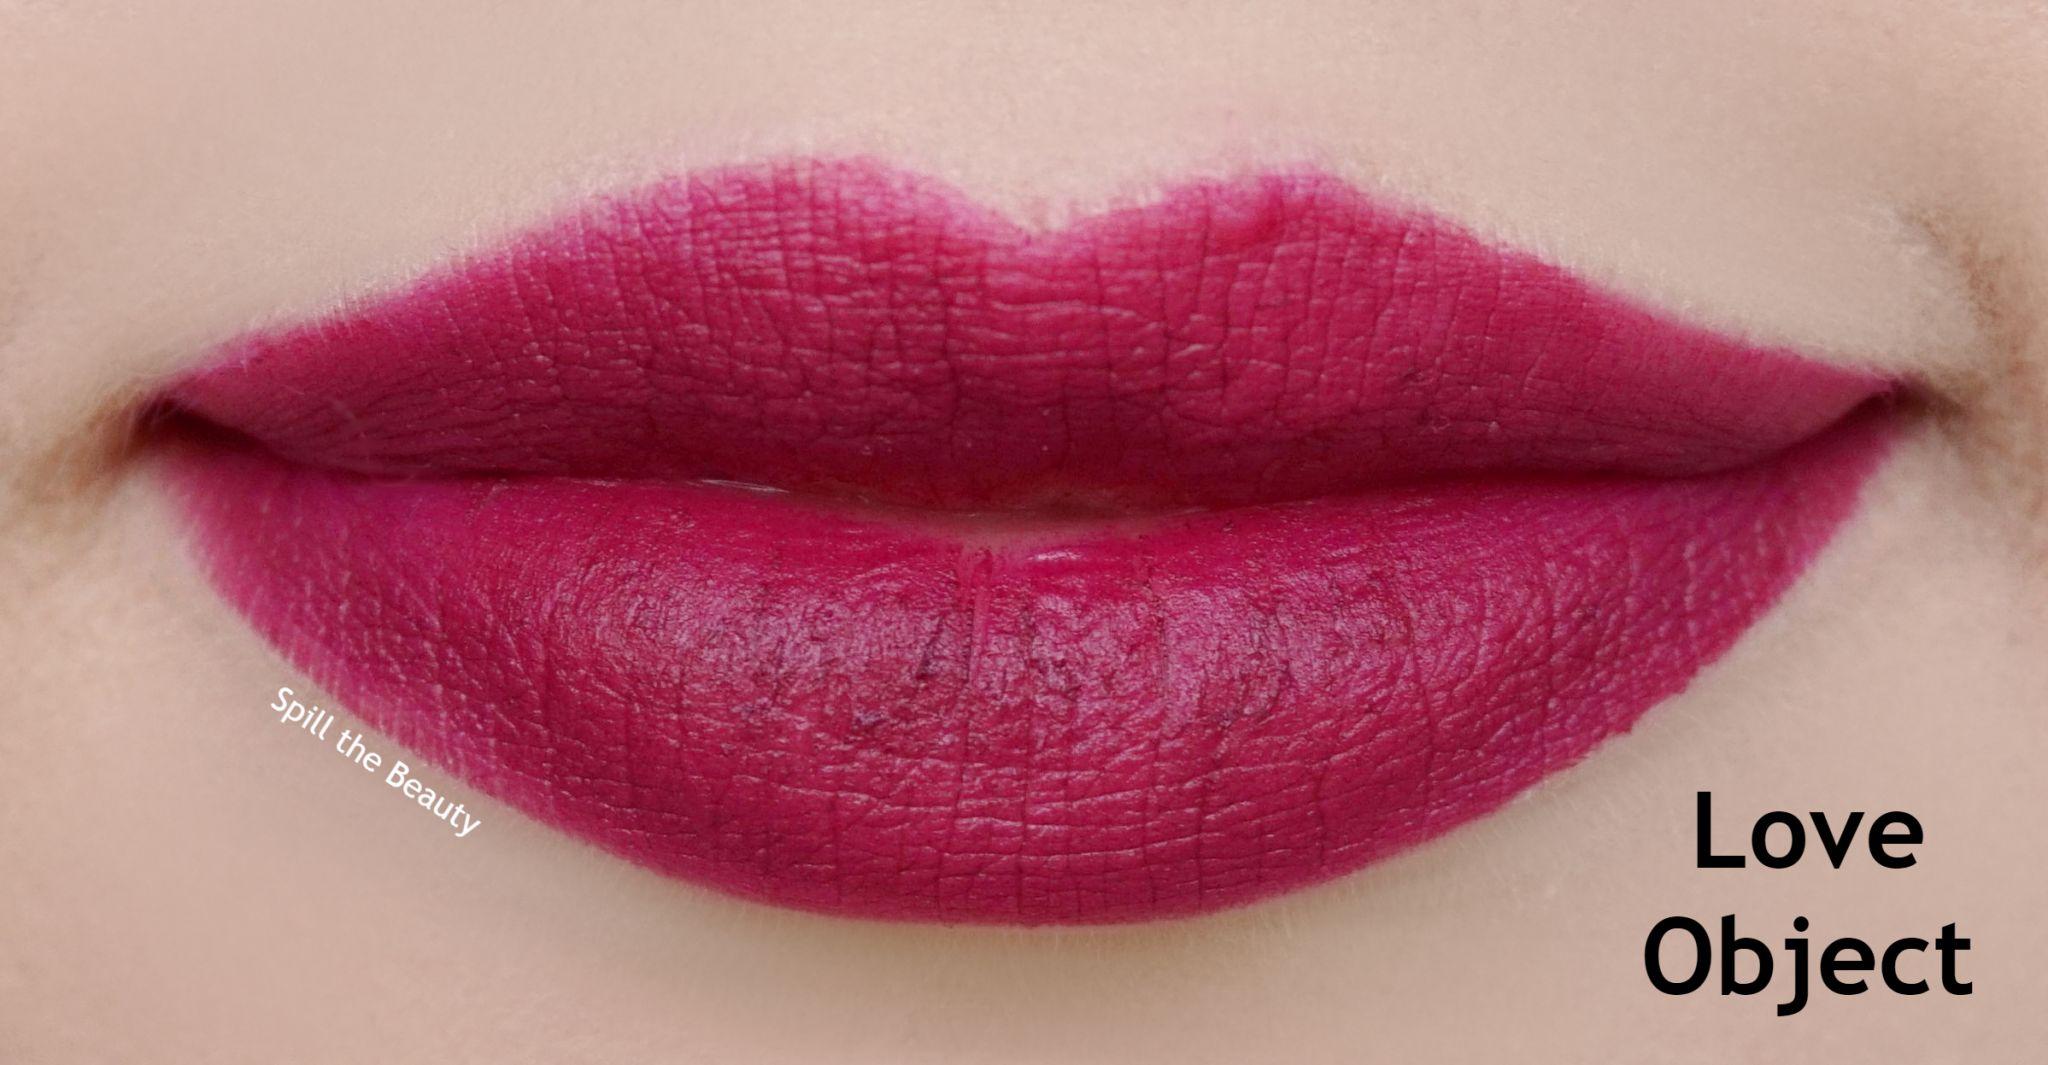 Estée Lauder Pure Color Love Lipstick in Love Object